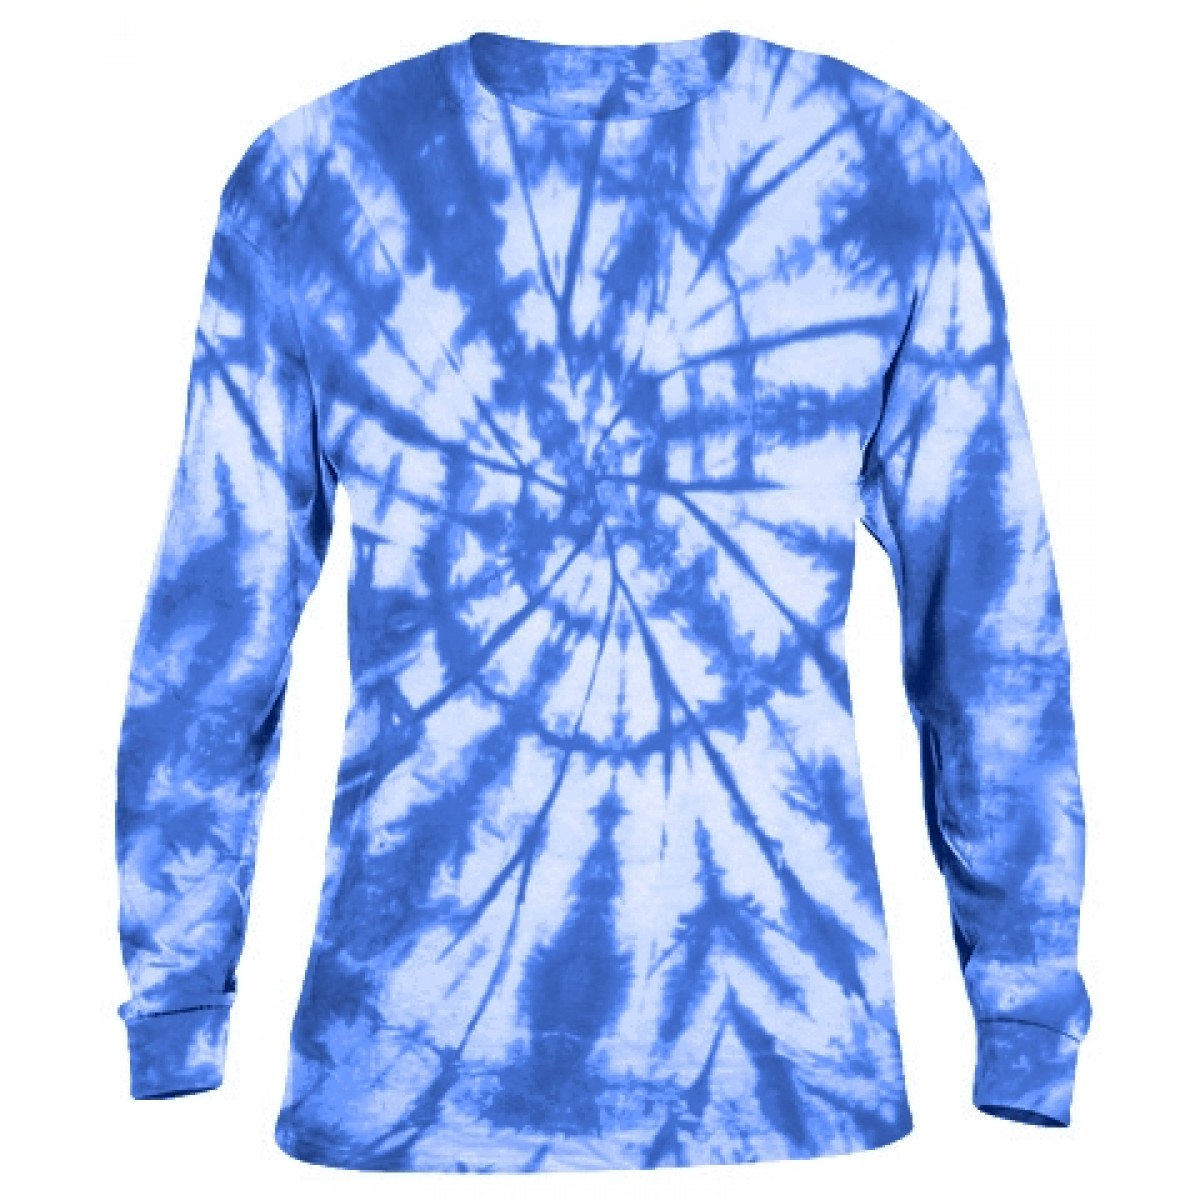 Tie-Dye Long Sleeve Shirt -Blue-S